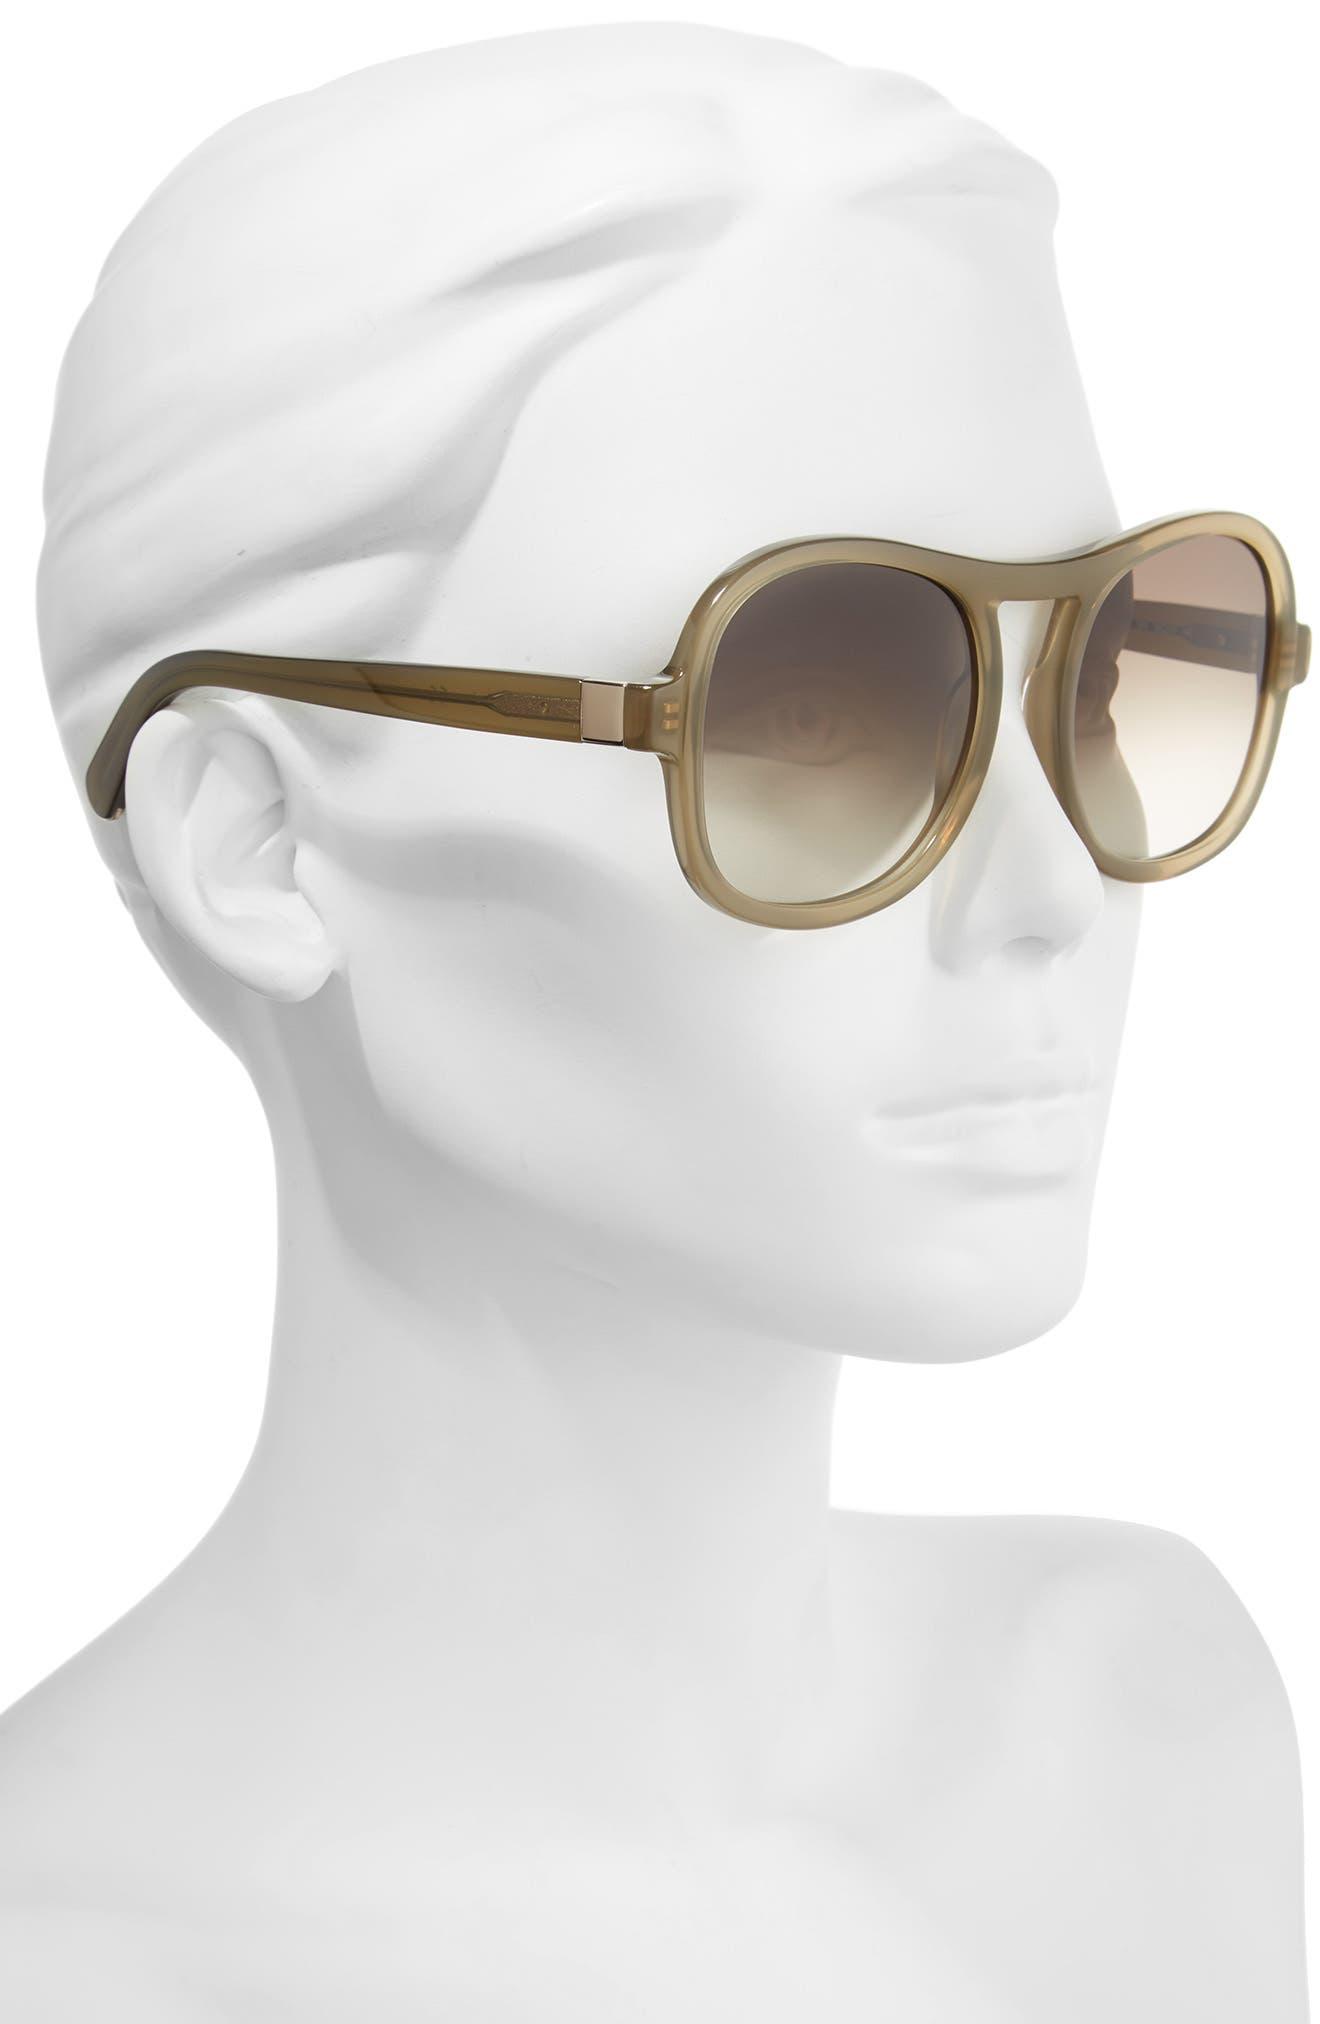 Marlow 56mm Gradient Lens Sunglasses,                             Alternate thumbnail 2, color,                             Khaki